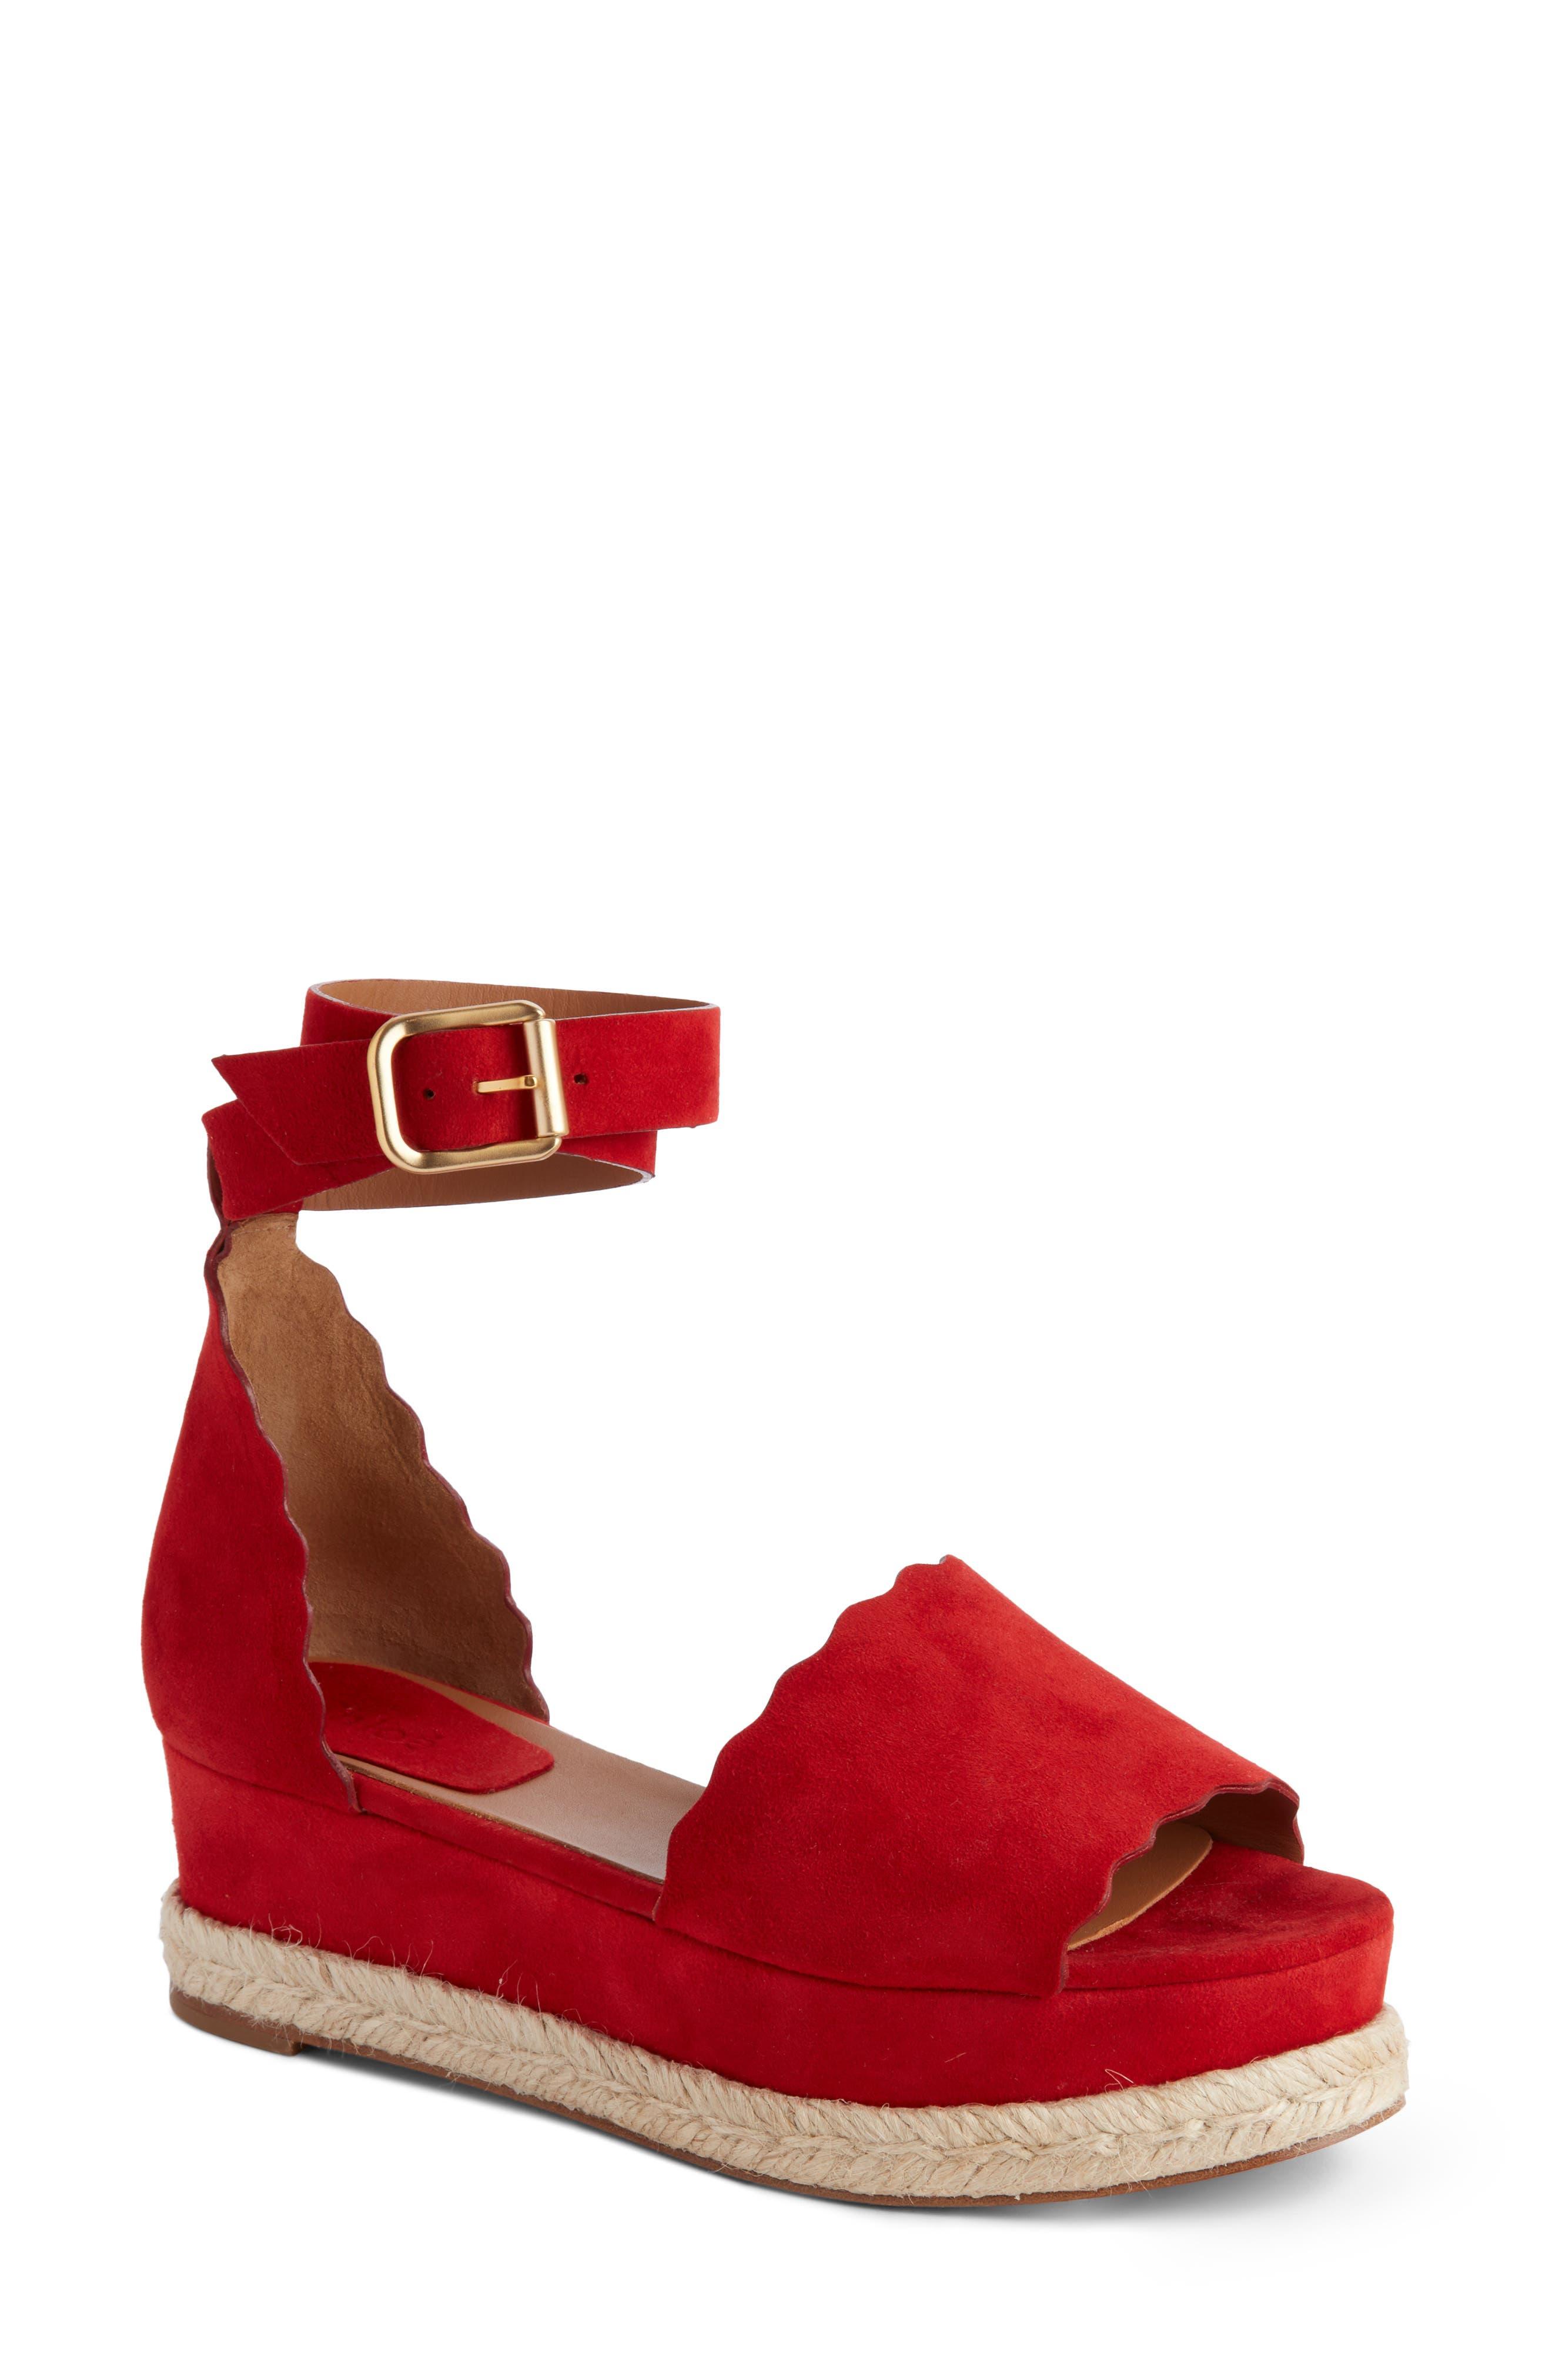 Lauren Espadrille Wedge Sandal,                             Main thumbnail 1, color,                             Red Flame